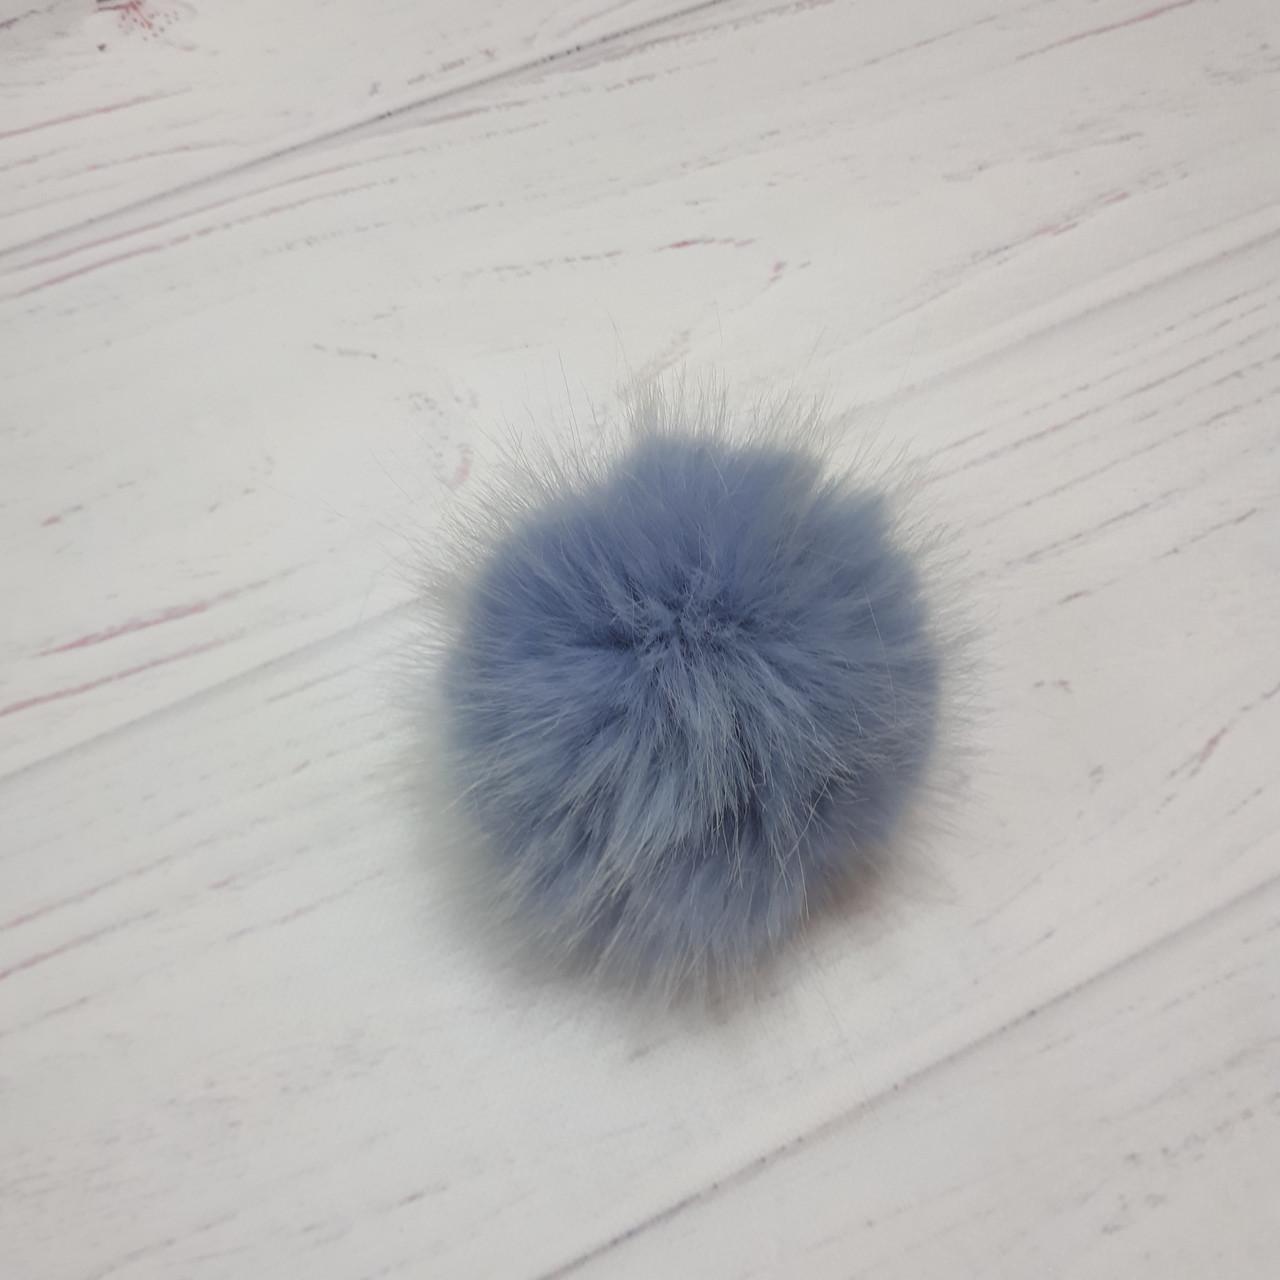 Бубон-помпон голубой (14 см)